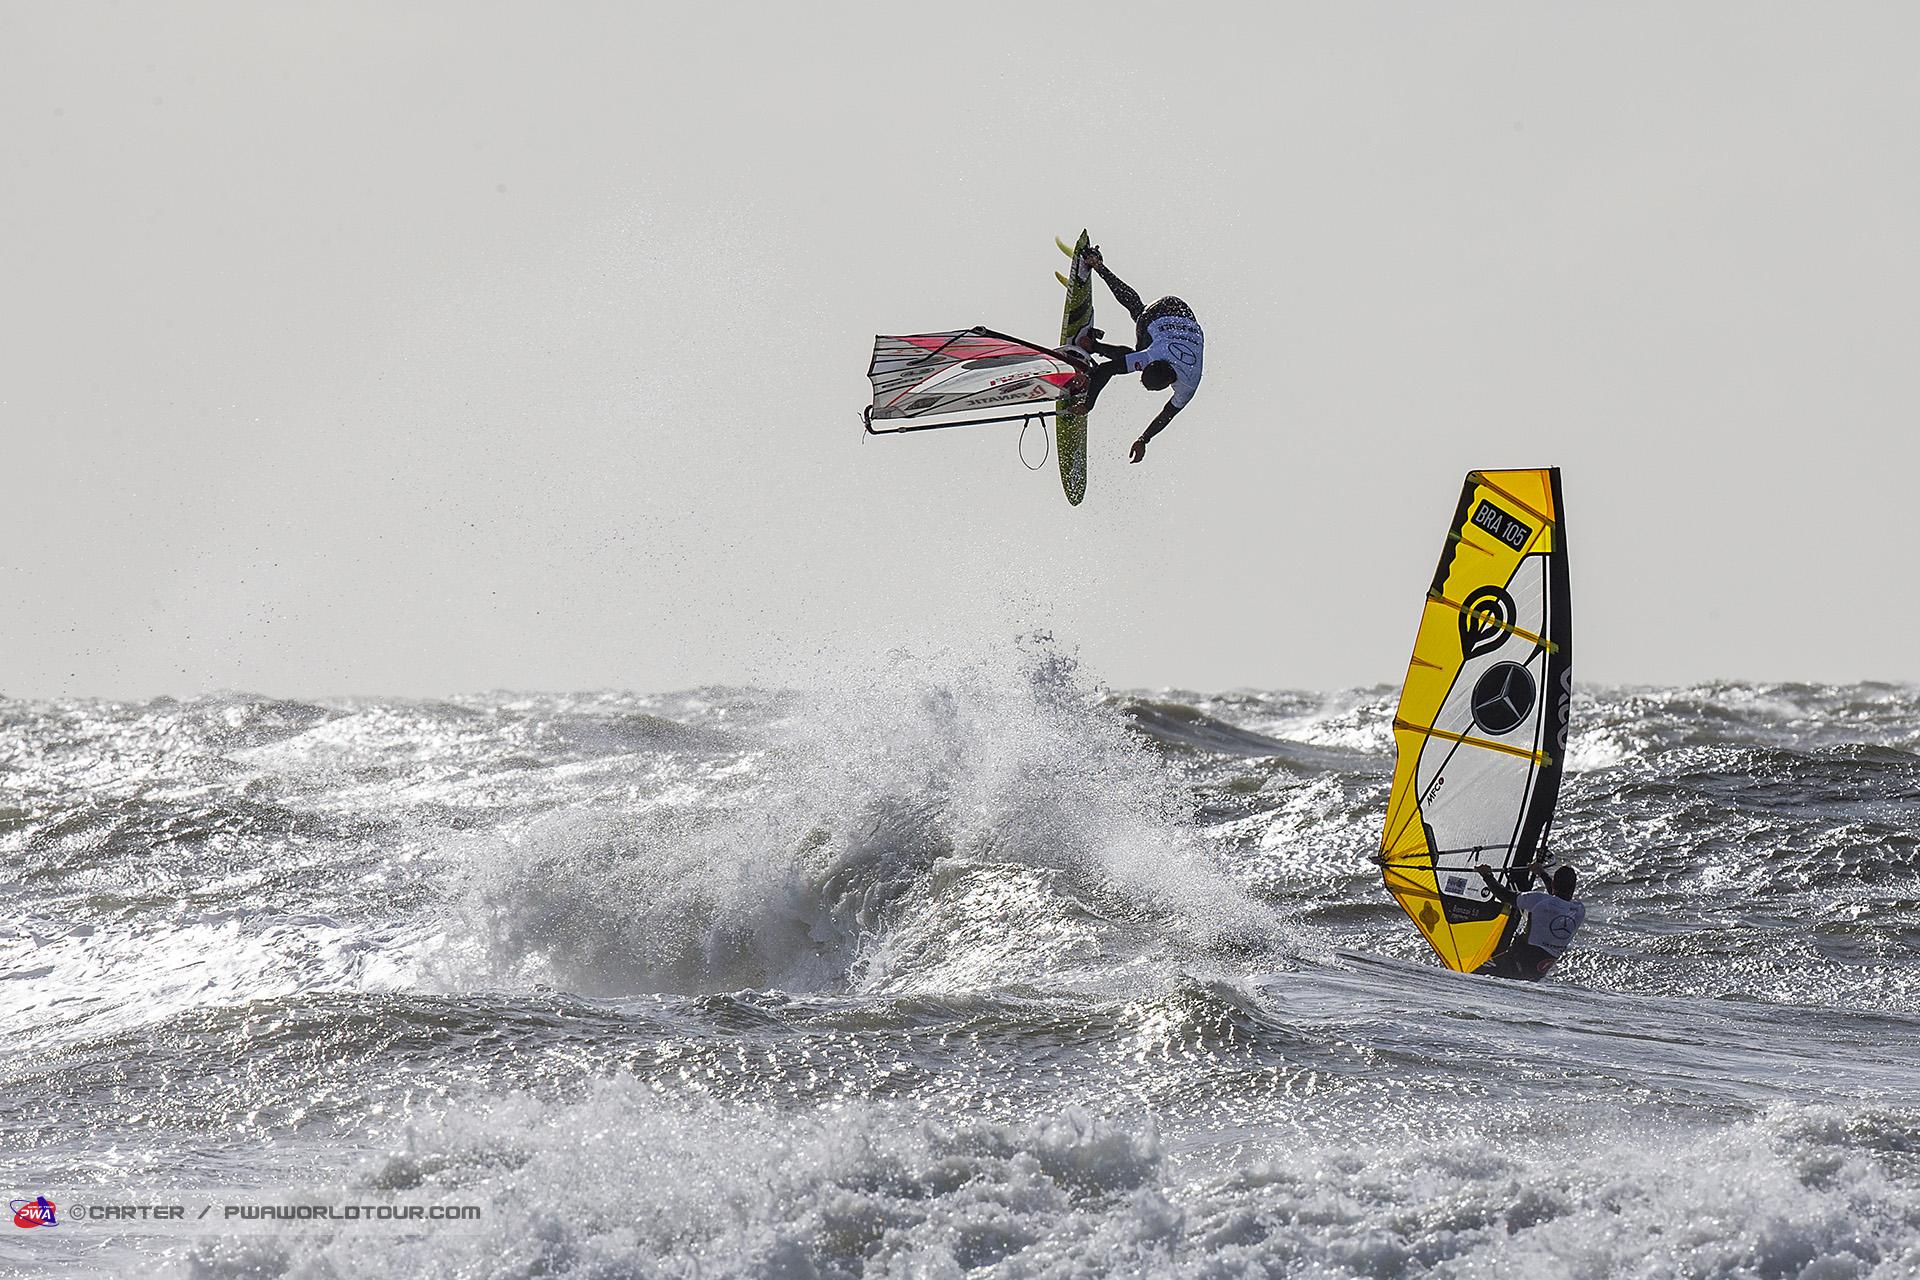 SY17_wv_Eagle_wing_from_Fernandez.jpg